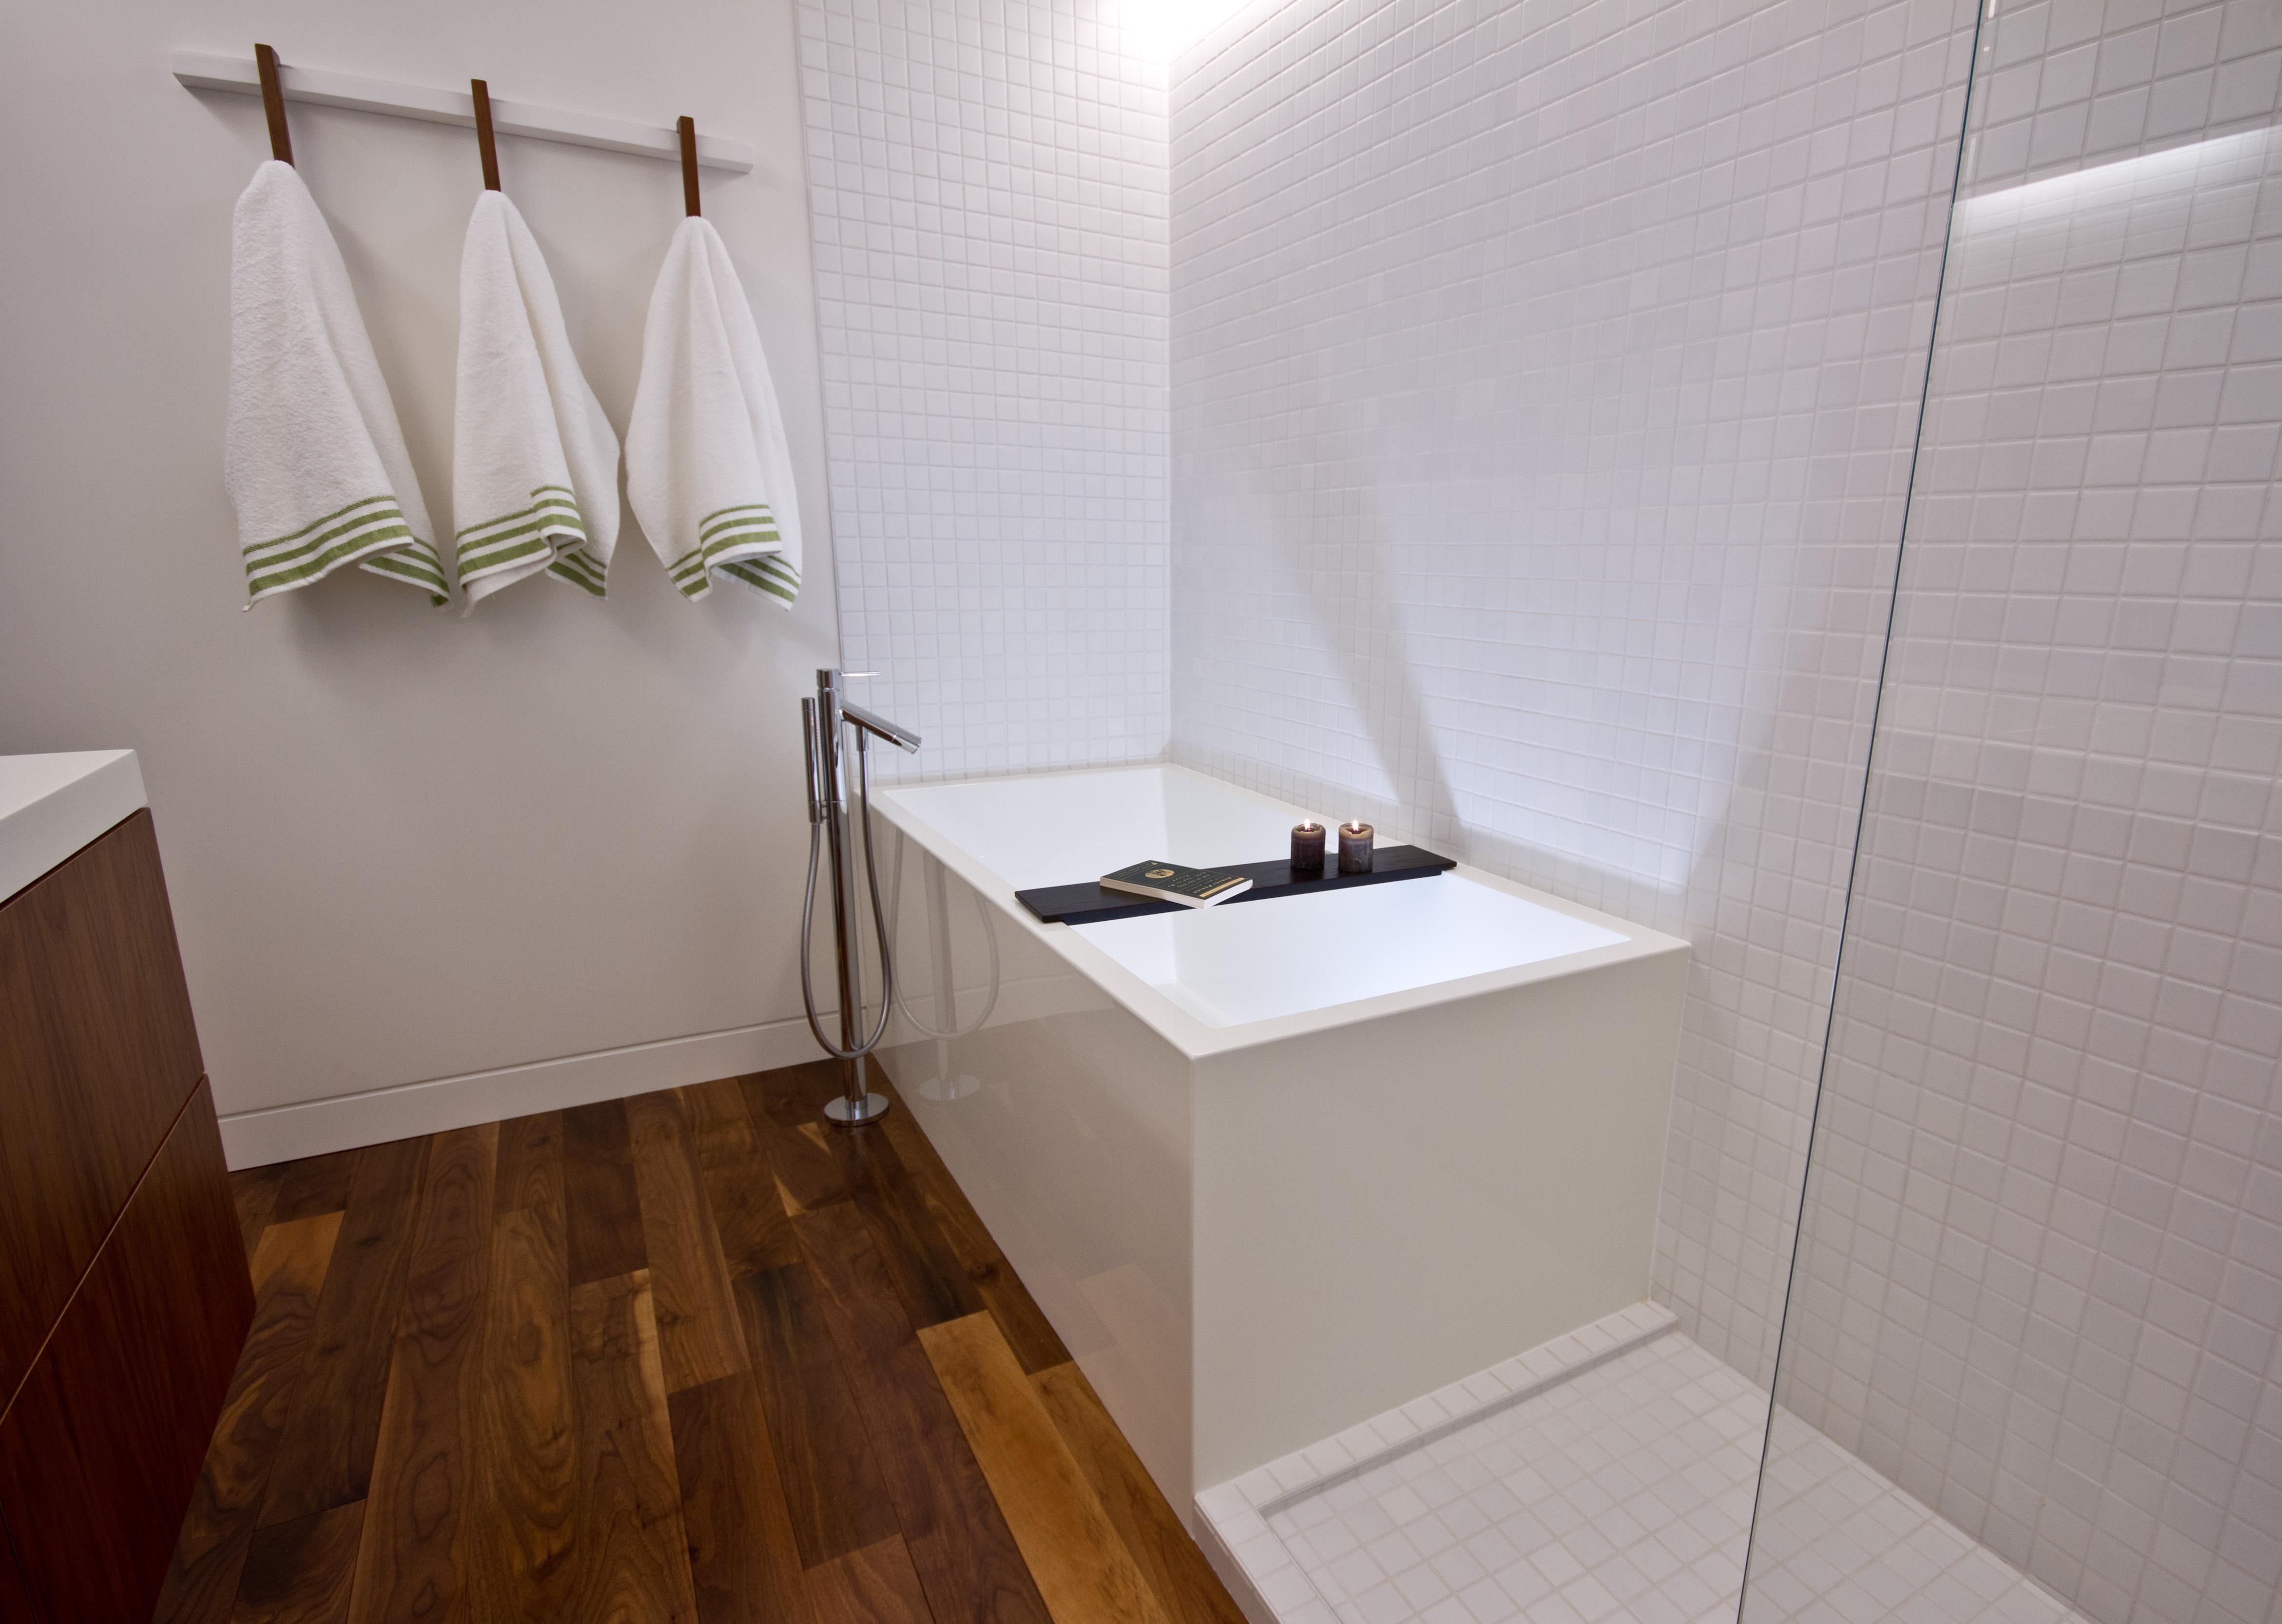 New Scandinavian Bathroom Decor With Modern Backsplash Design